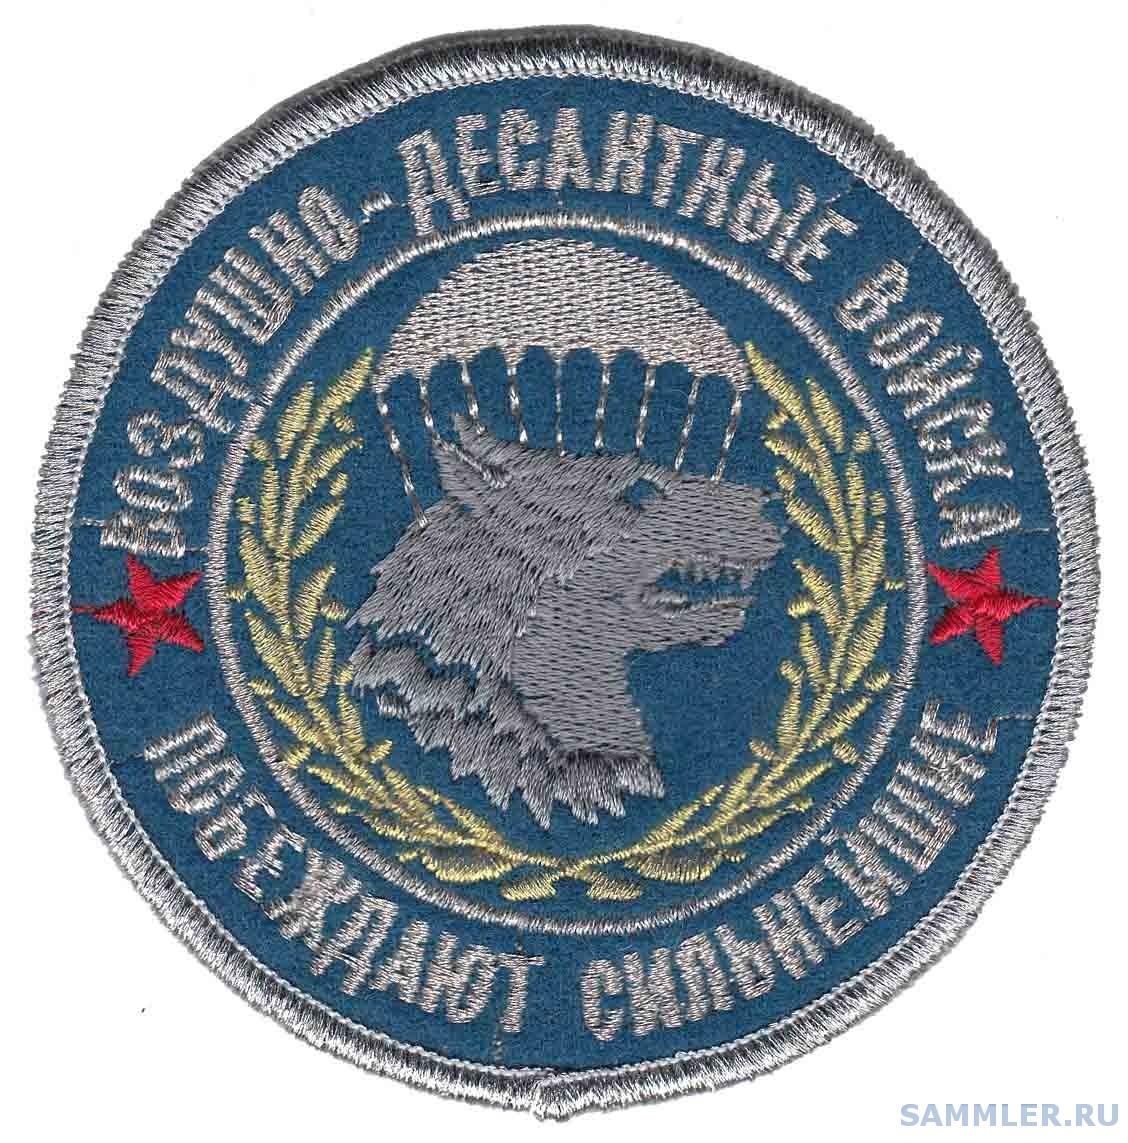 45 полк спец. назначения_0008.jpg